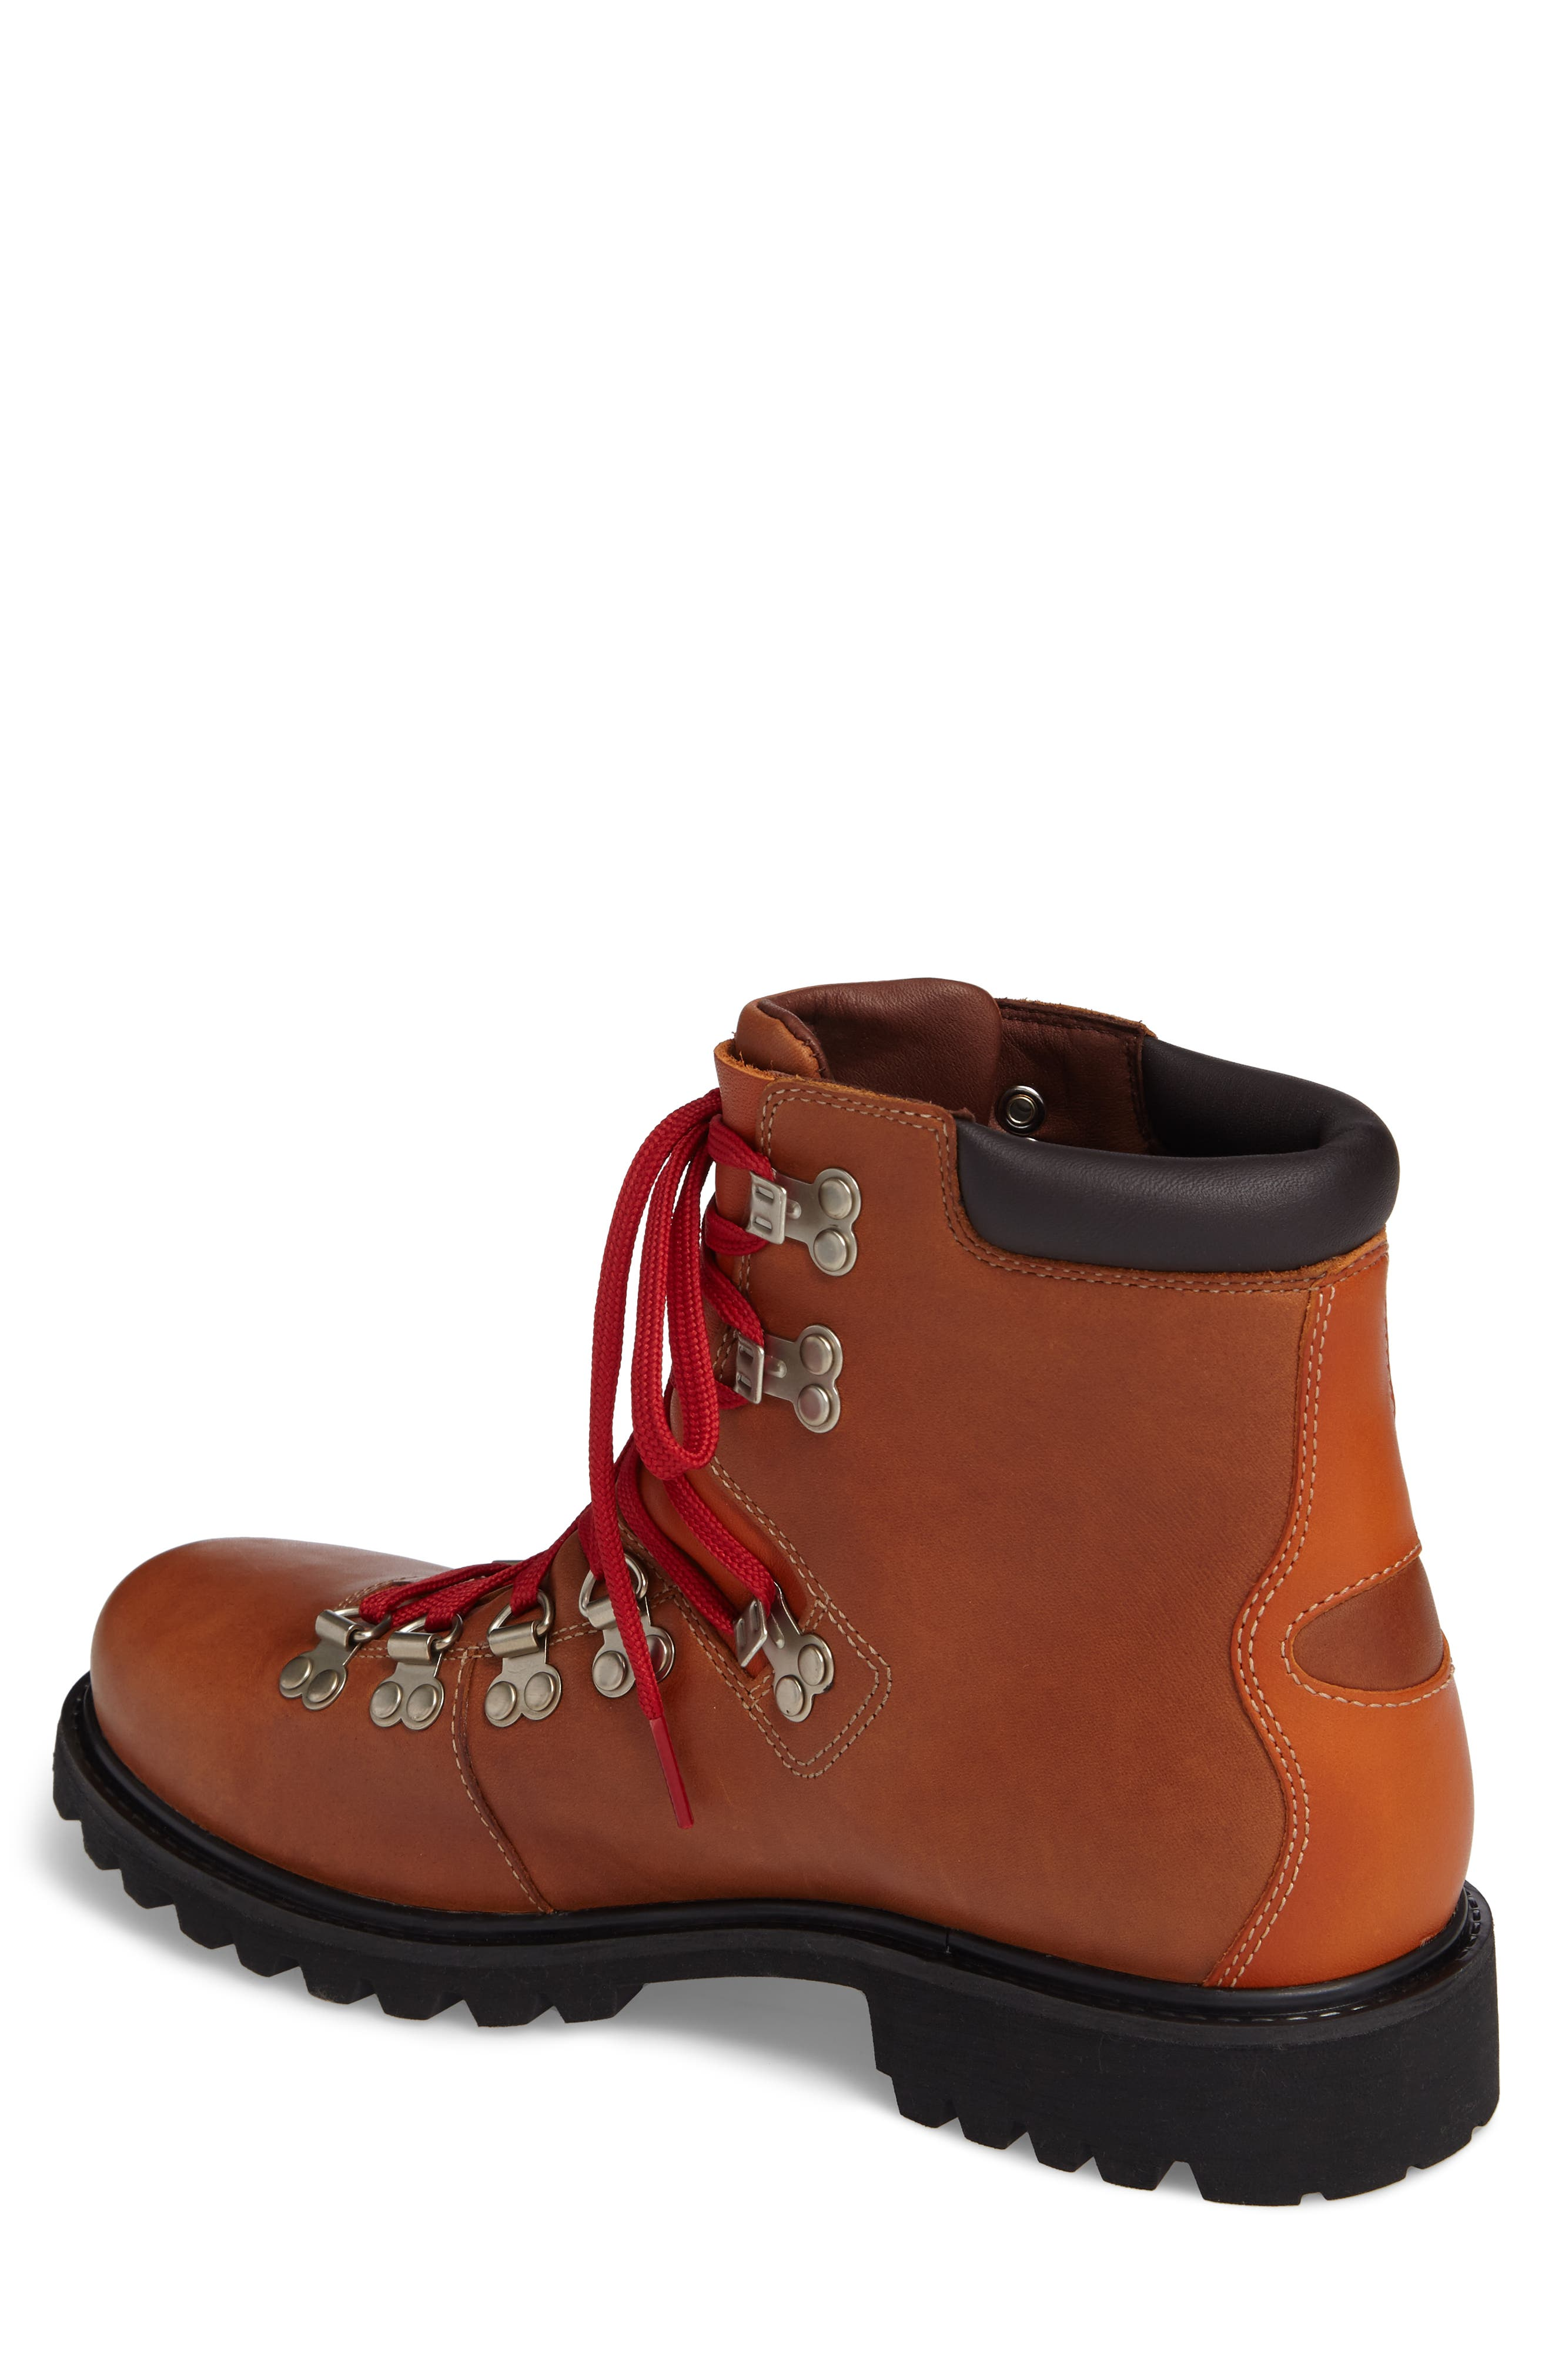 1978 Waterproof Boot,                             Alternate thumbnail 2, color,                             Claypot